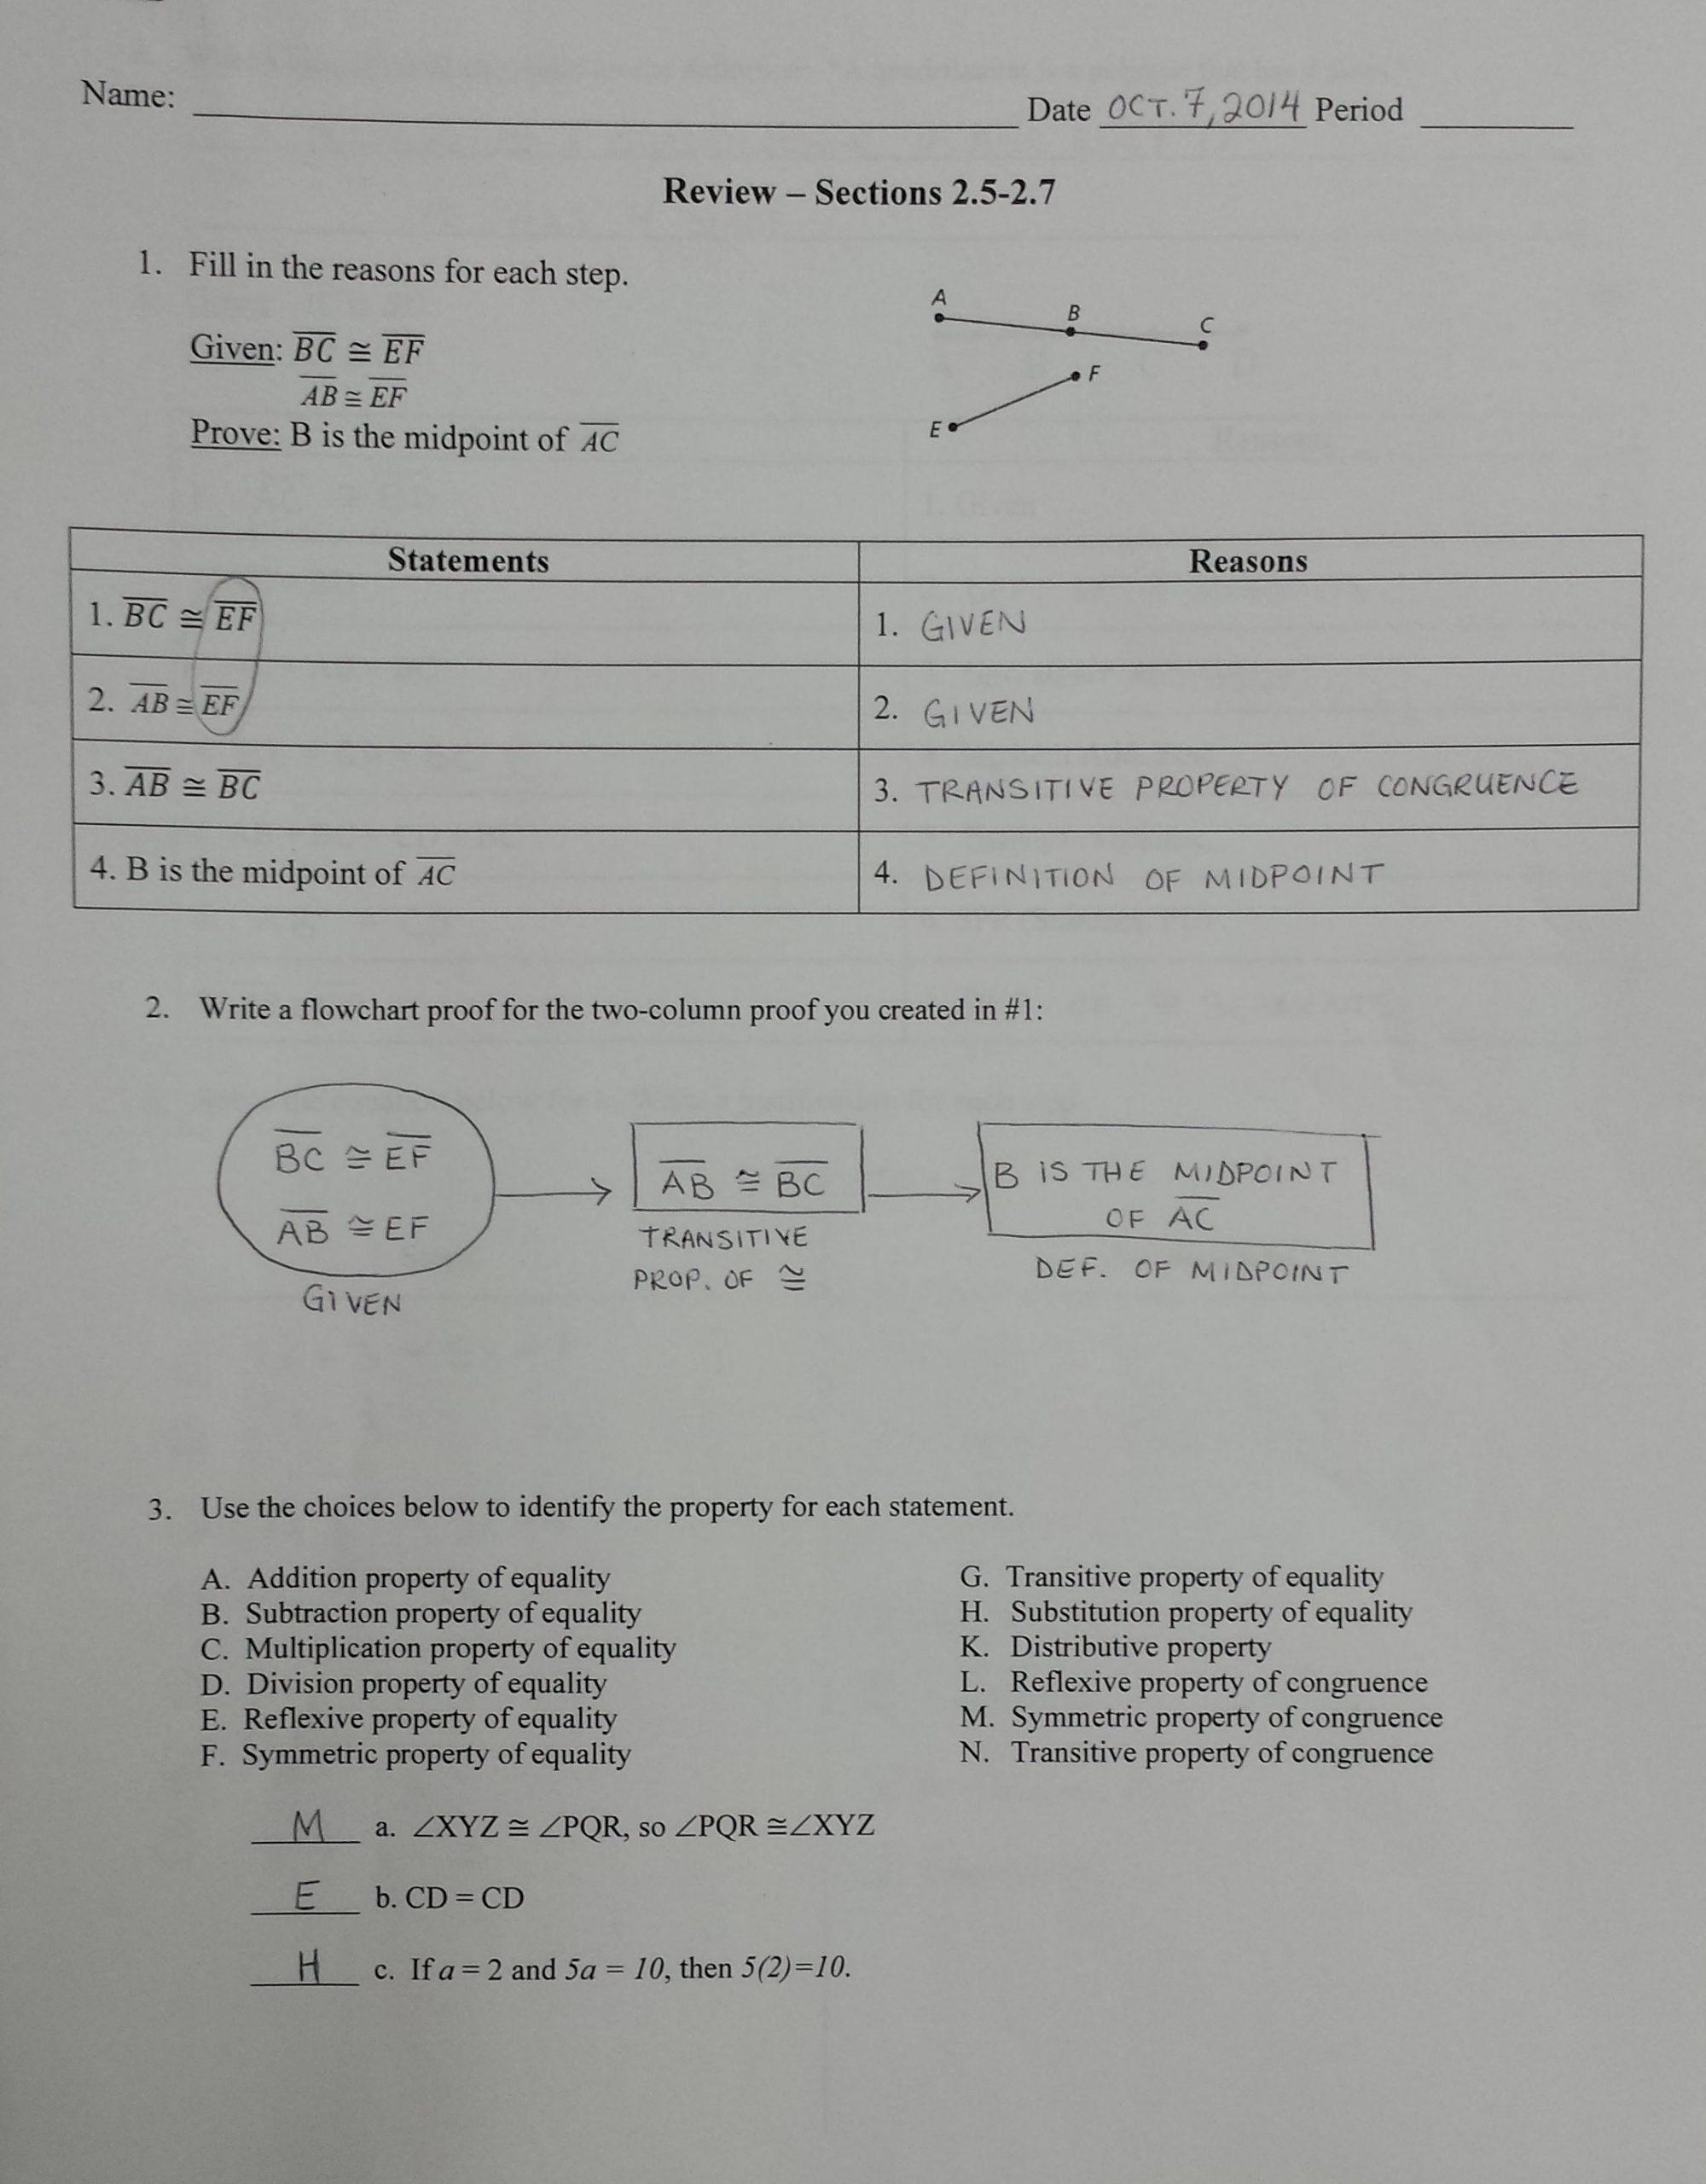 Algebraic Proof Worksheet Answers 2 6 Algebraic Proof Worksheet Answers In 2020 Letter Worksheets For Preschool Algebraic Proof Pre Algebra Worksheets